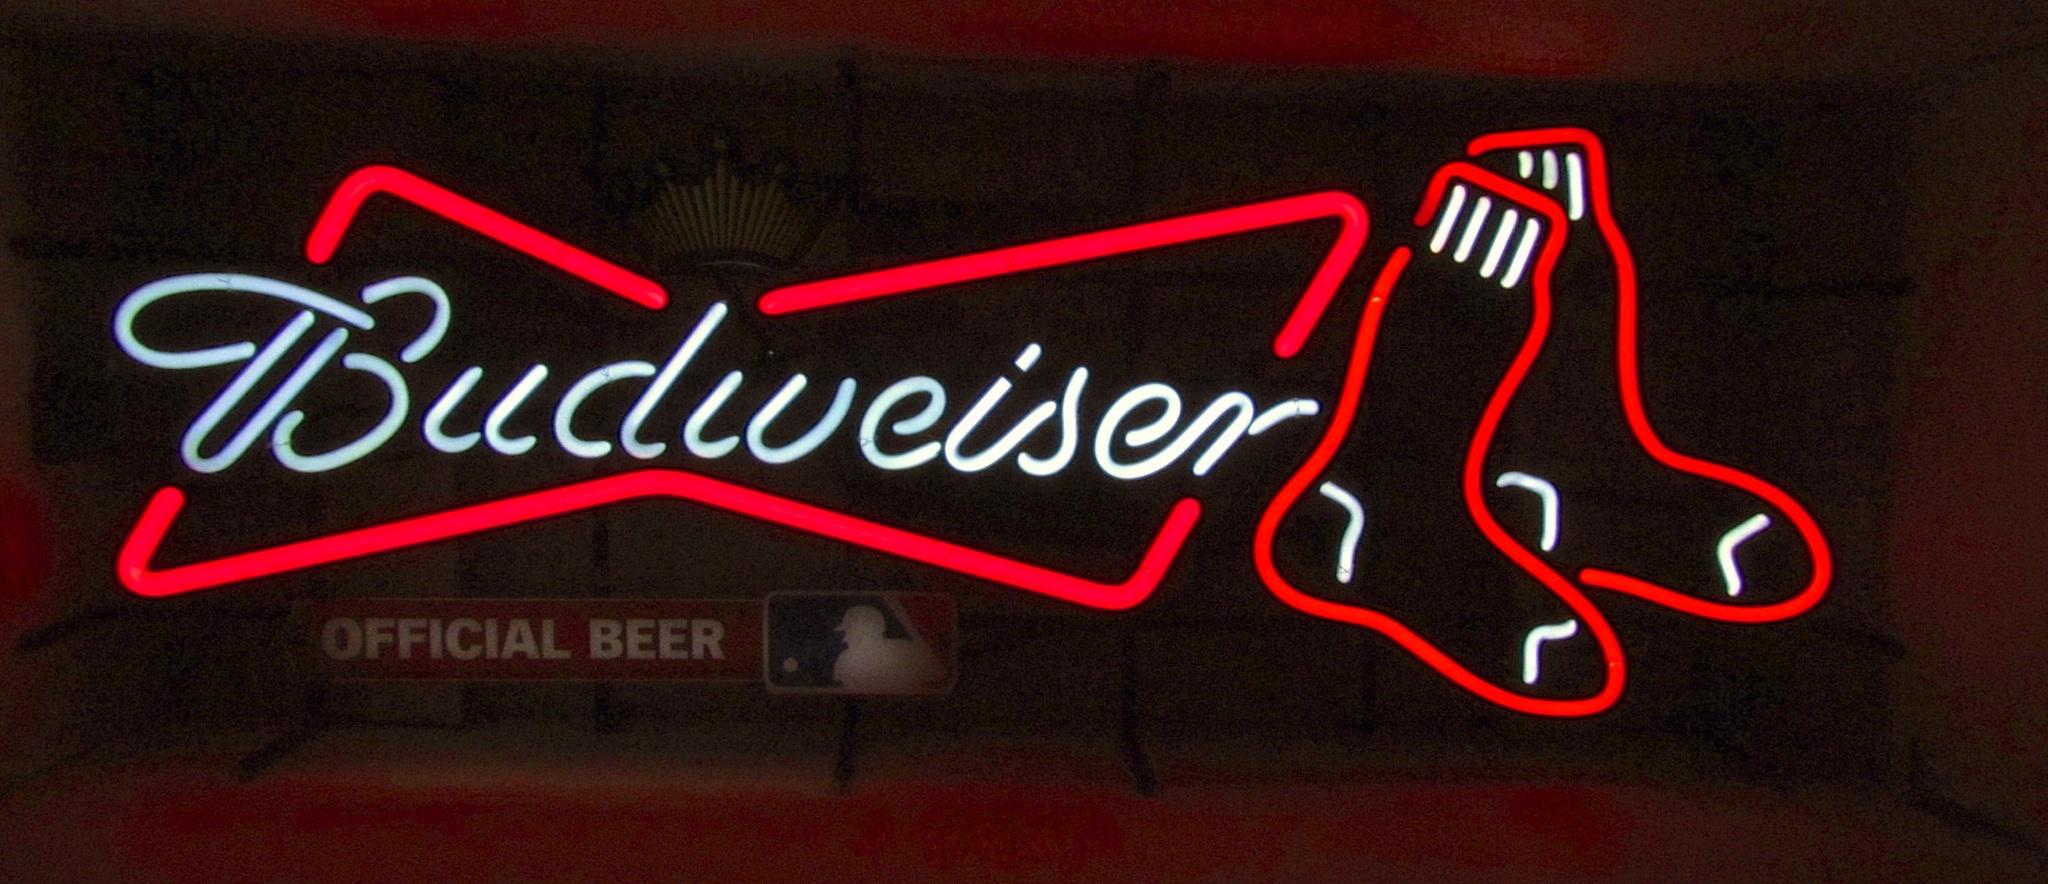 beer sign neon sox boston